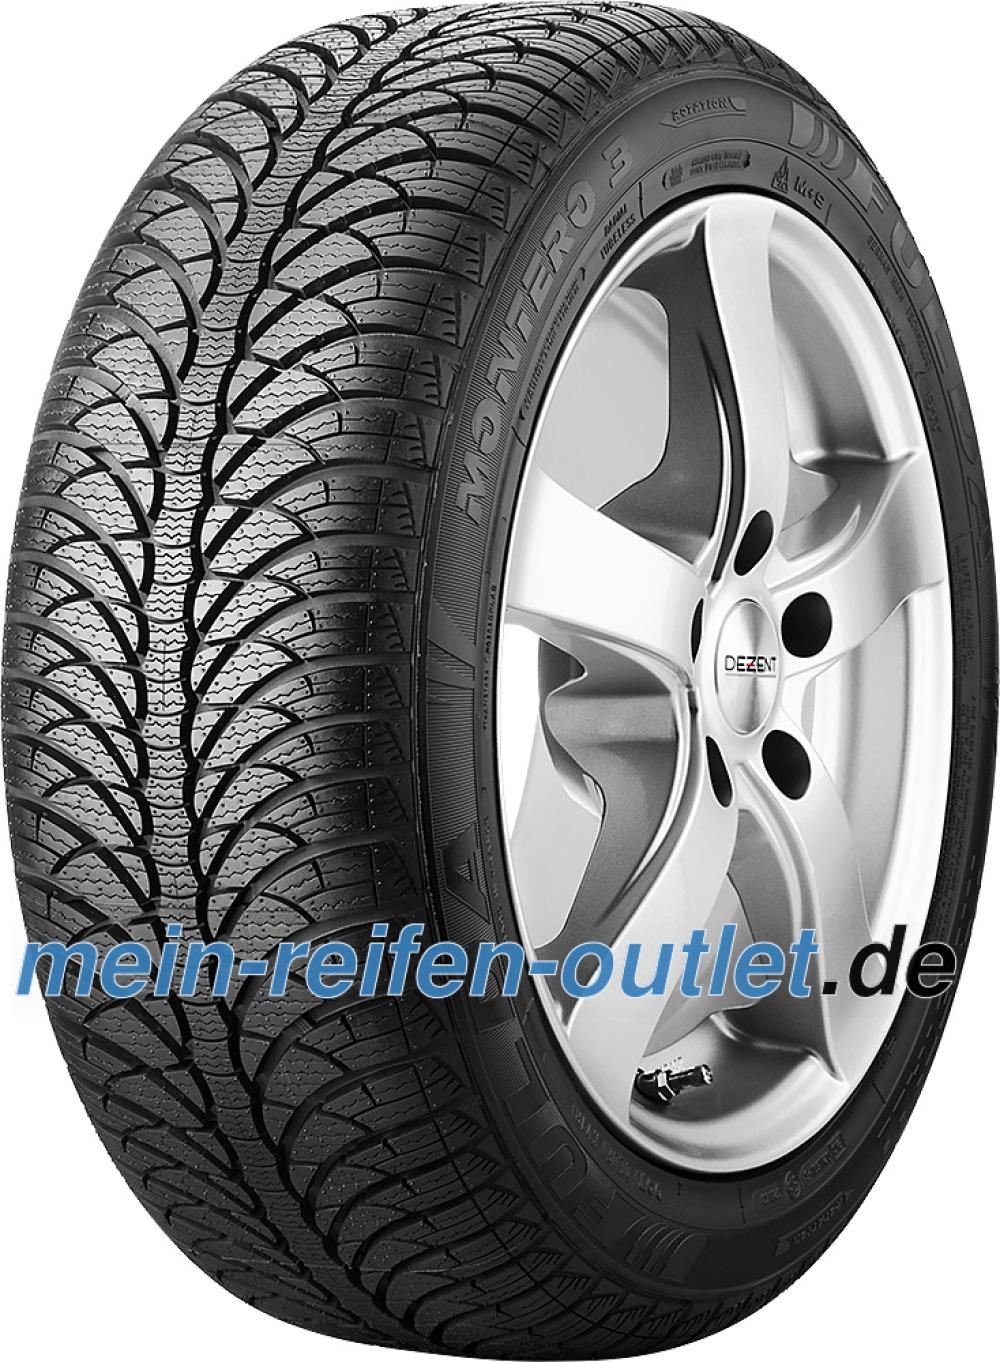 Fulda Kristall Montero 3 ( 195/60 R16C 99/97T 6PR )